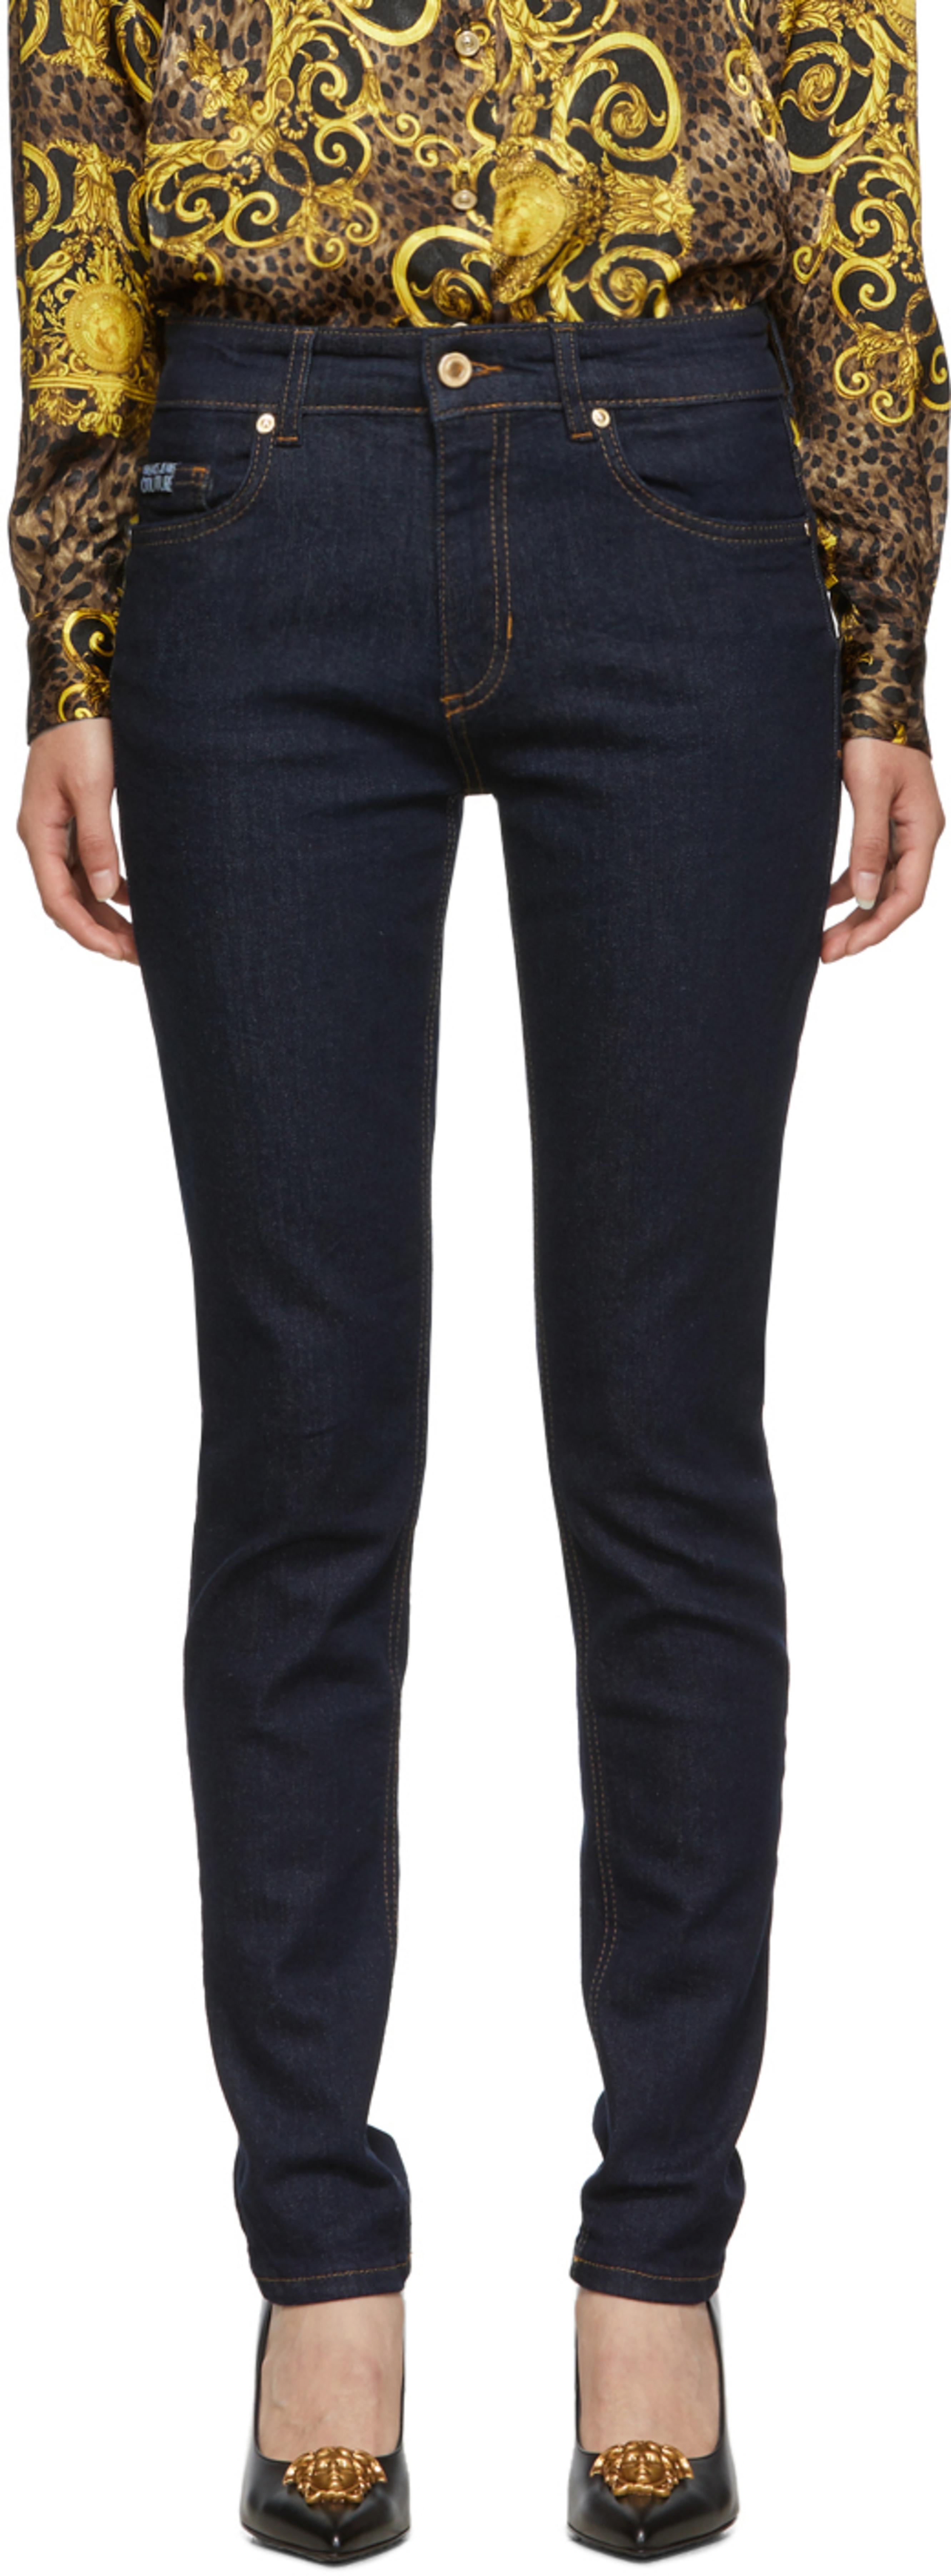 0b0329b48a Indigo Classic Jeans